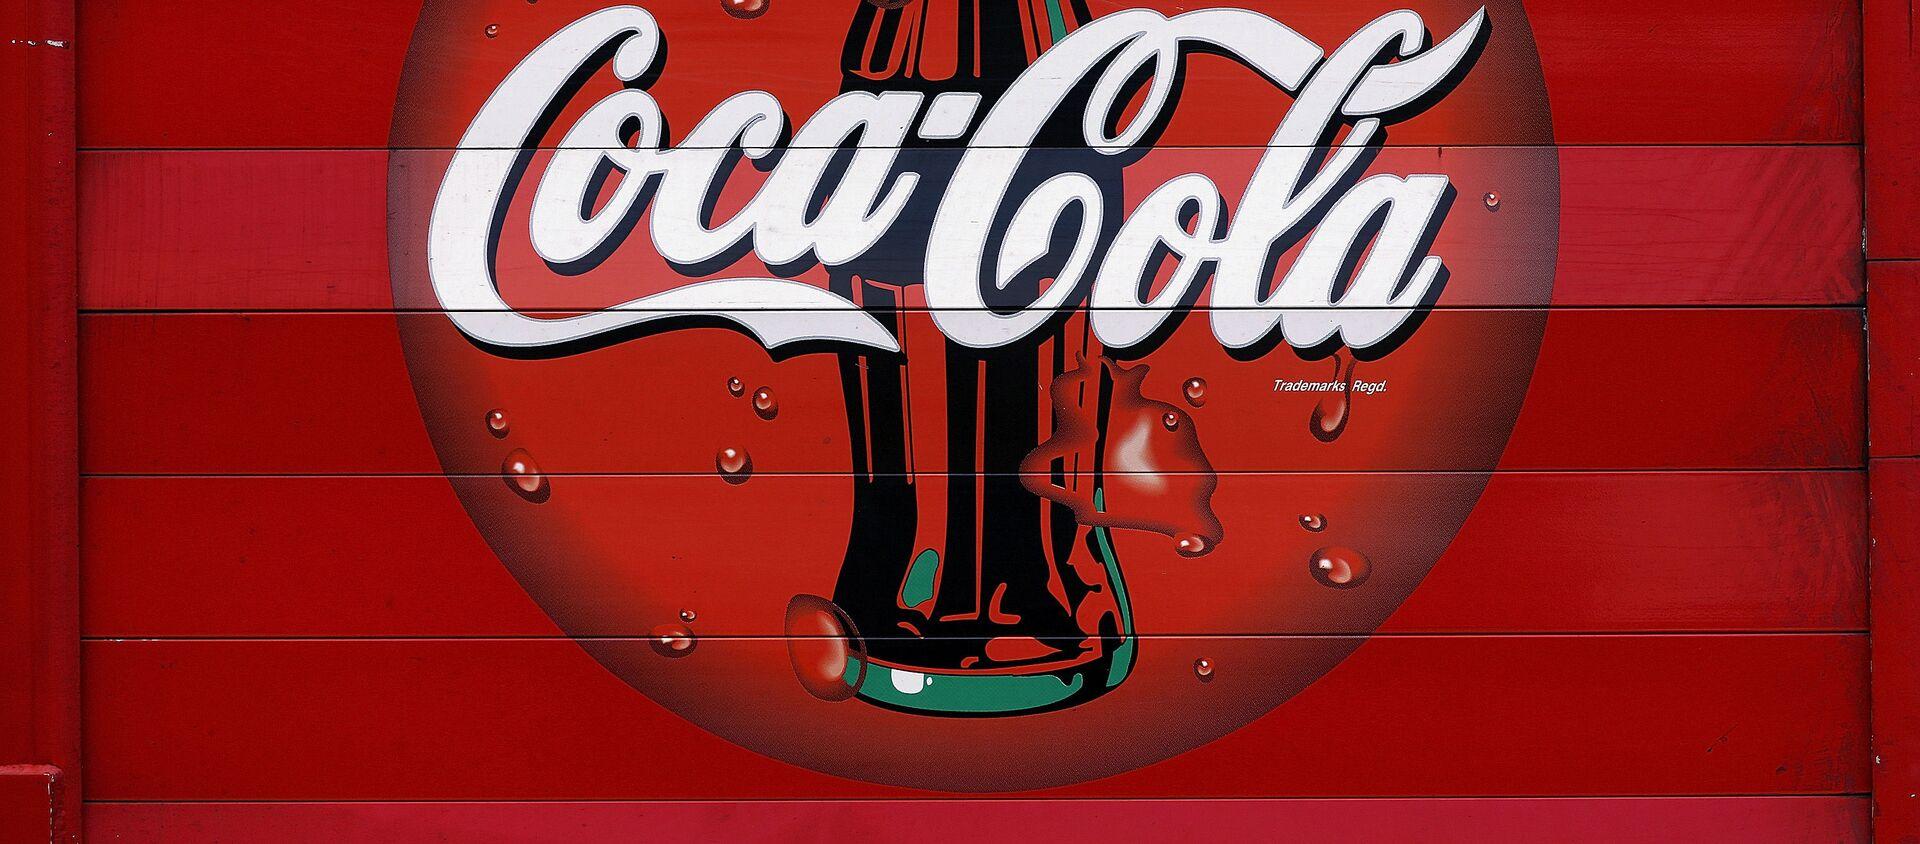 Coca Cola - Sputnik Việt Nam, 1920, 06.08.2019